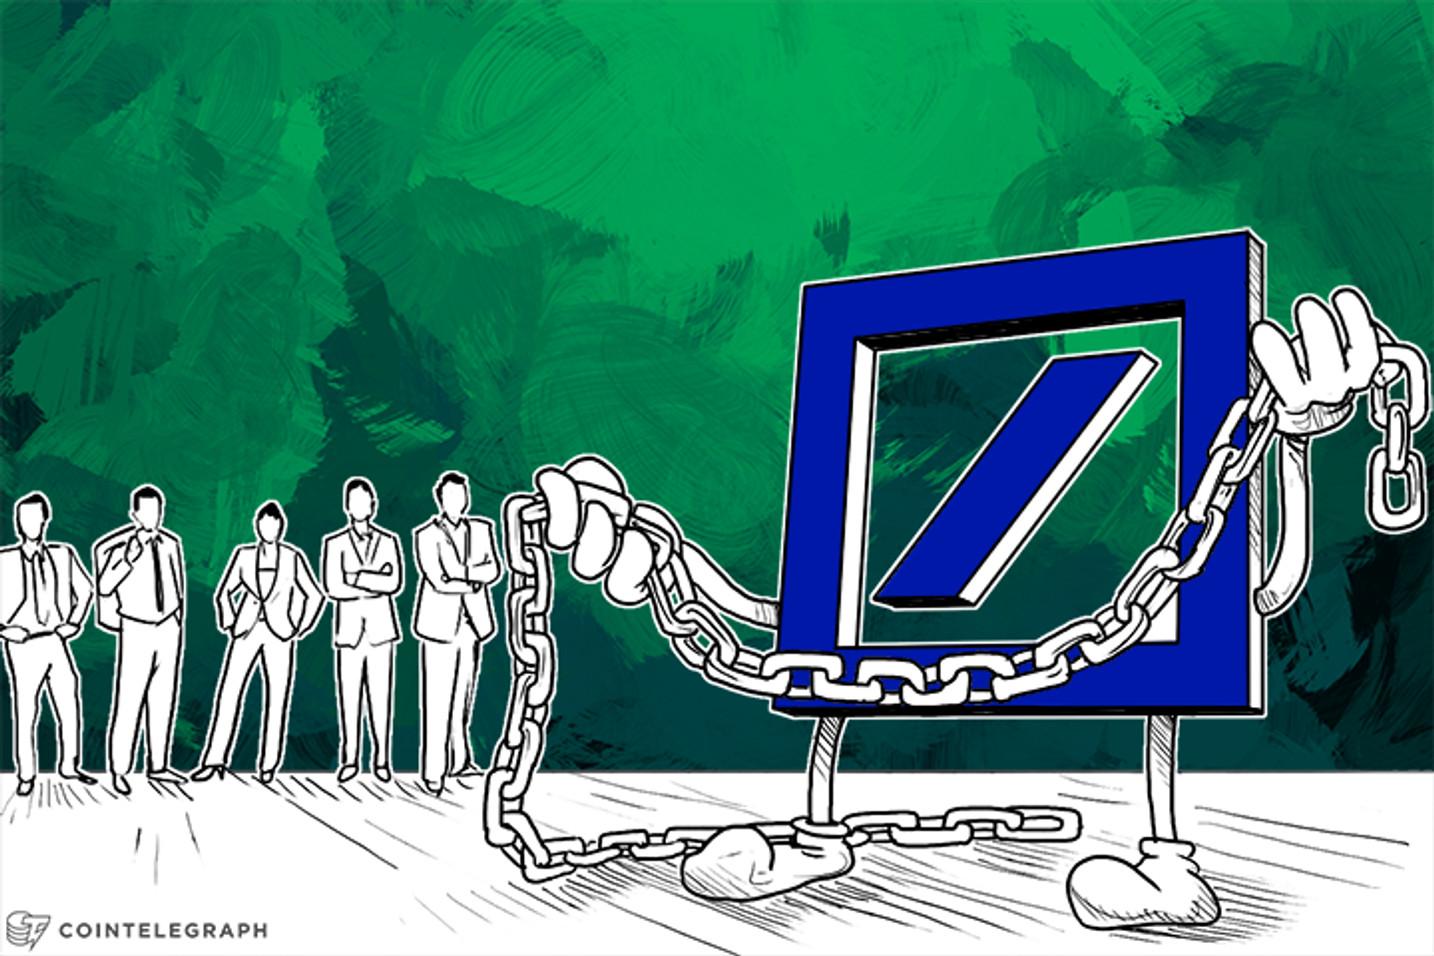 Deutsche Bank: The Blockchain is a 'Truly Disruptive Idea'